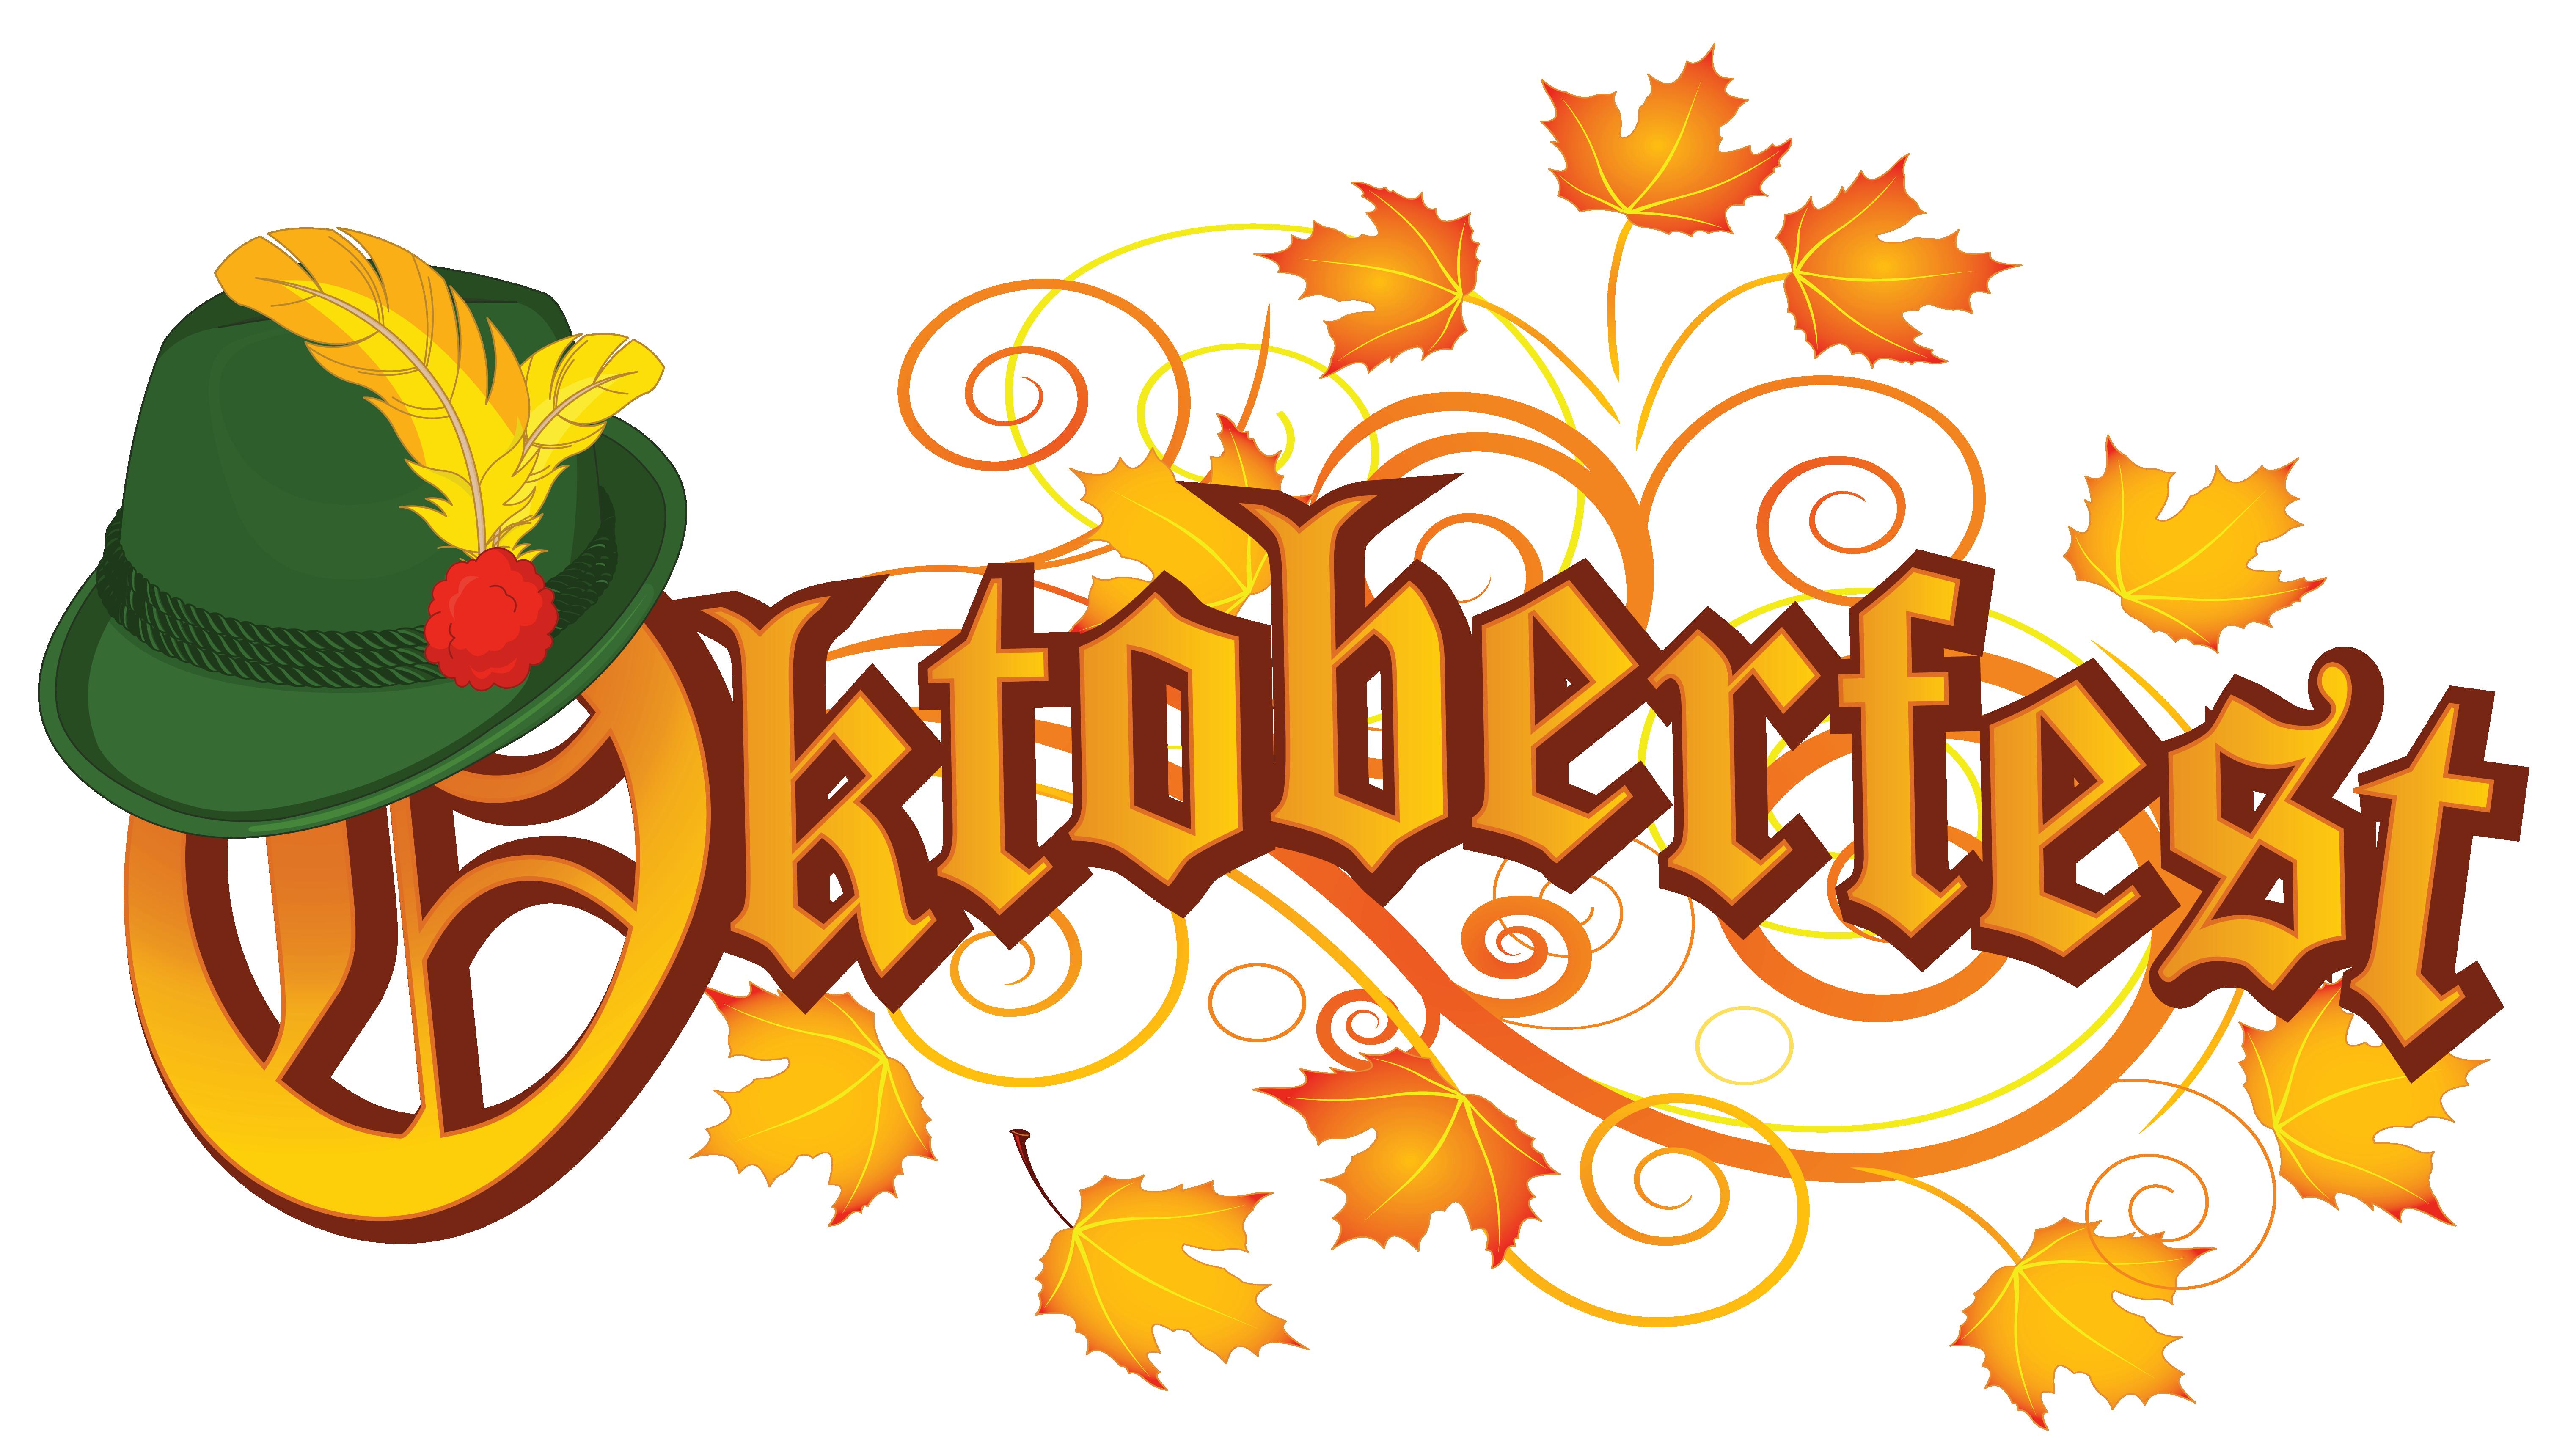 Oktoberfest text png image. Spider clipart decor